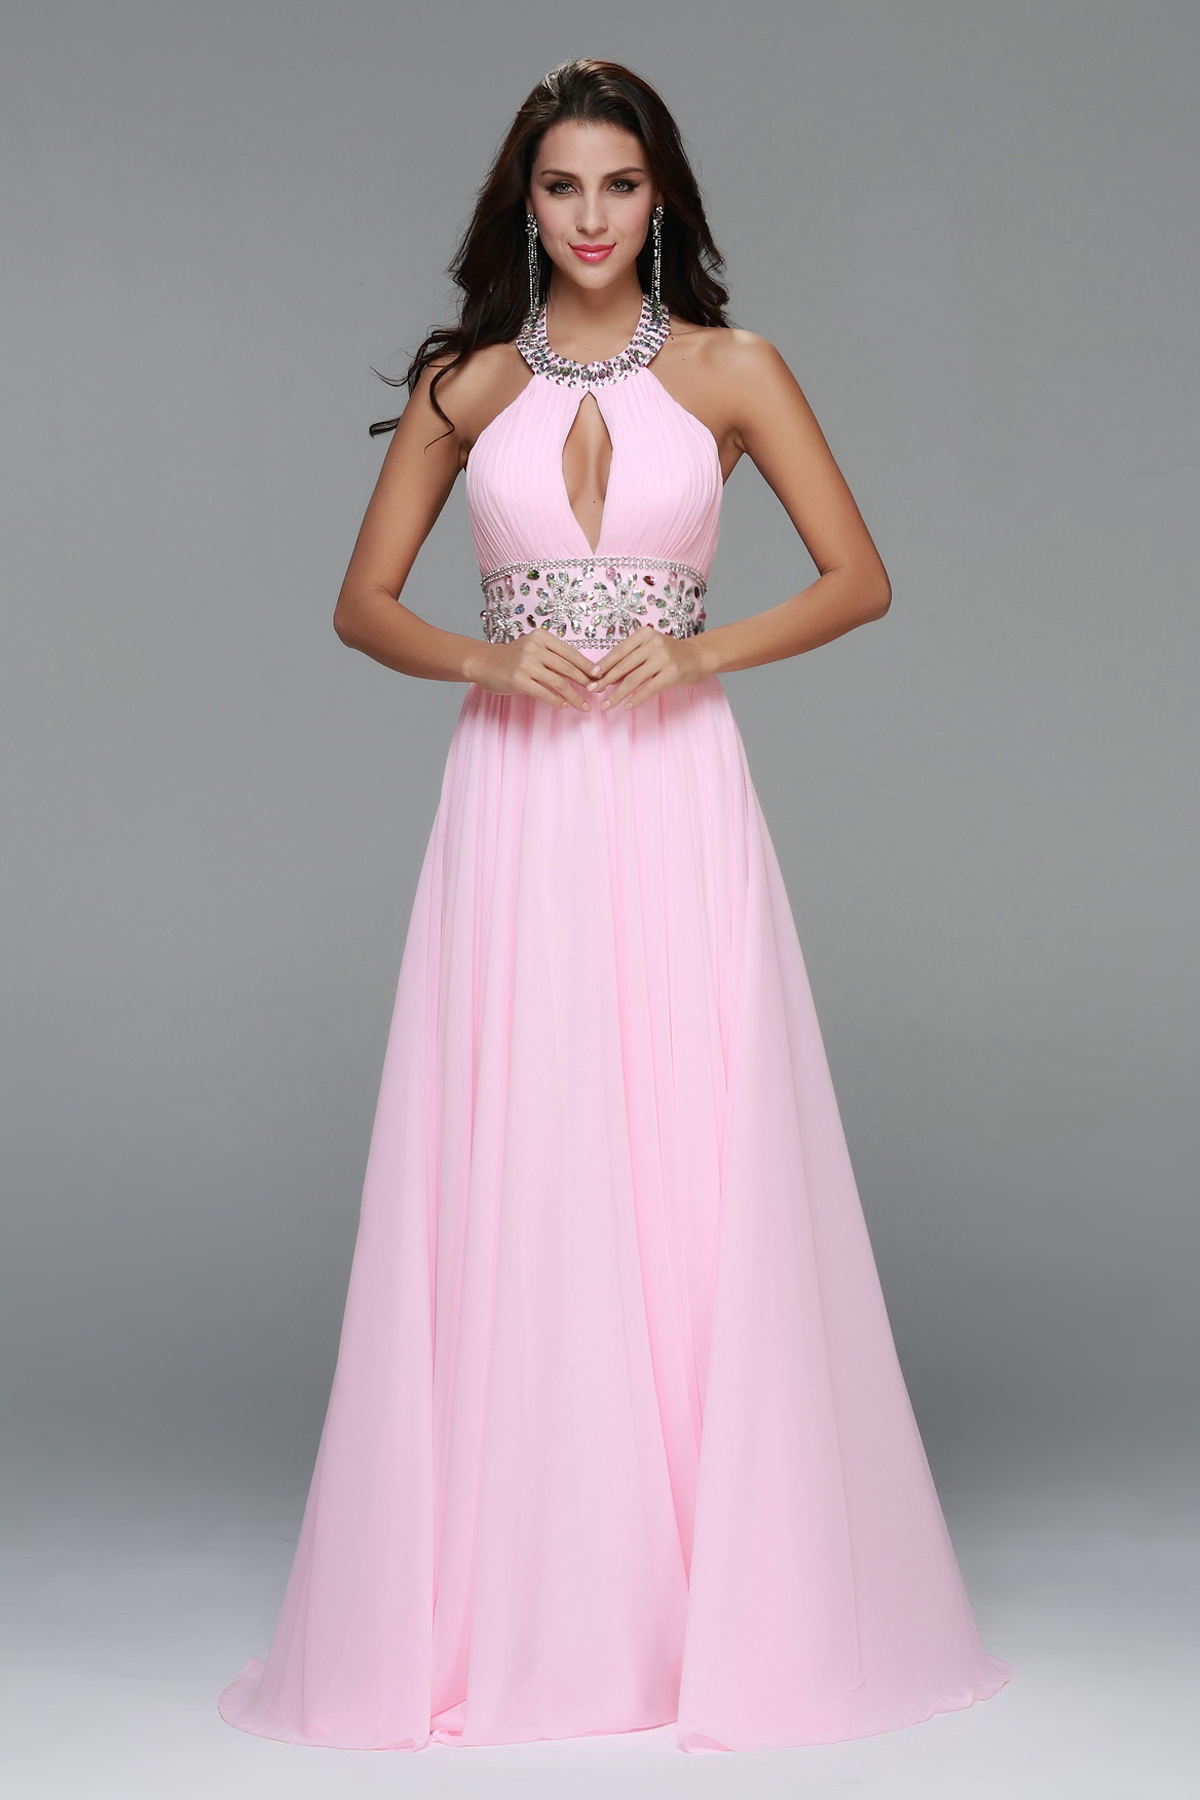 Long Halter To Prom Dresses - Plus Size Prom Dresses